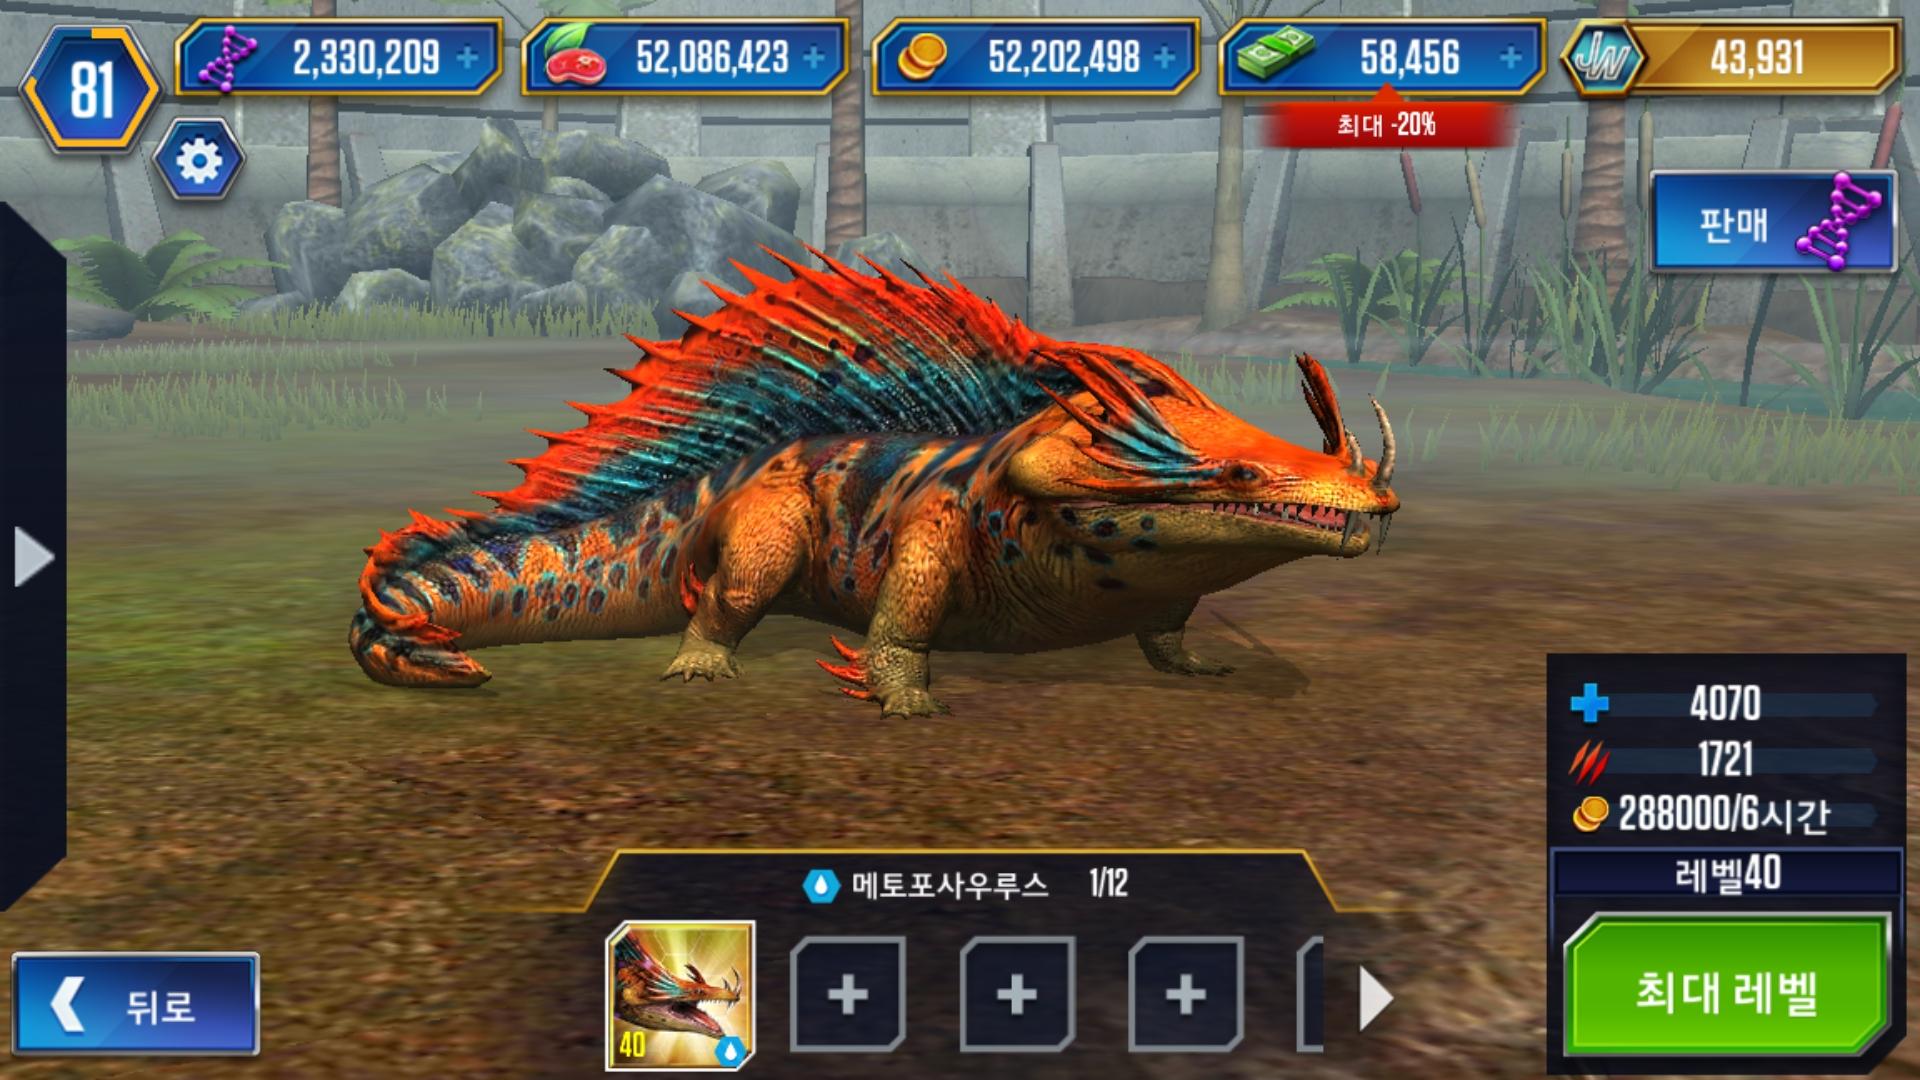 Screenshot_20200210-022257_Jurassic World.jpg